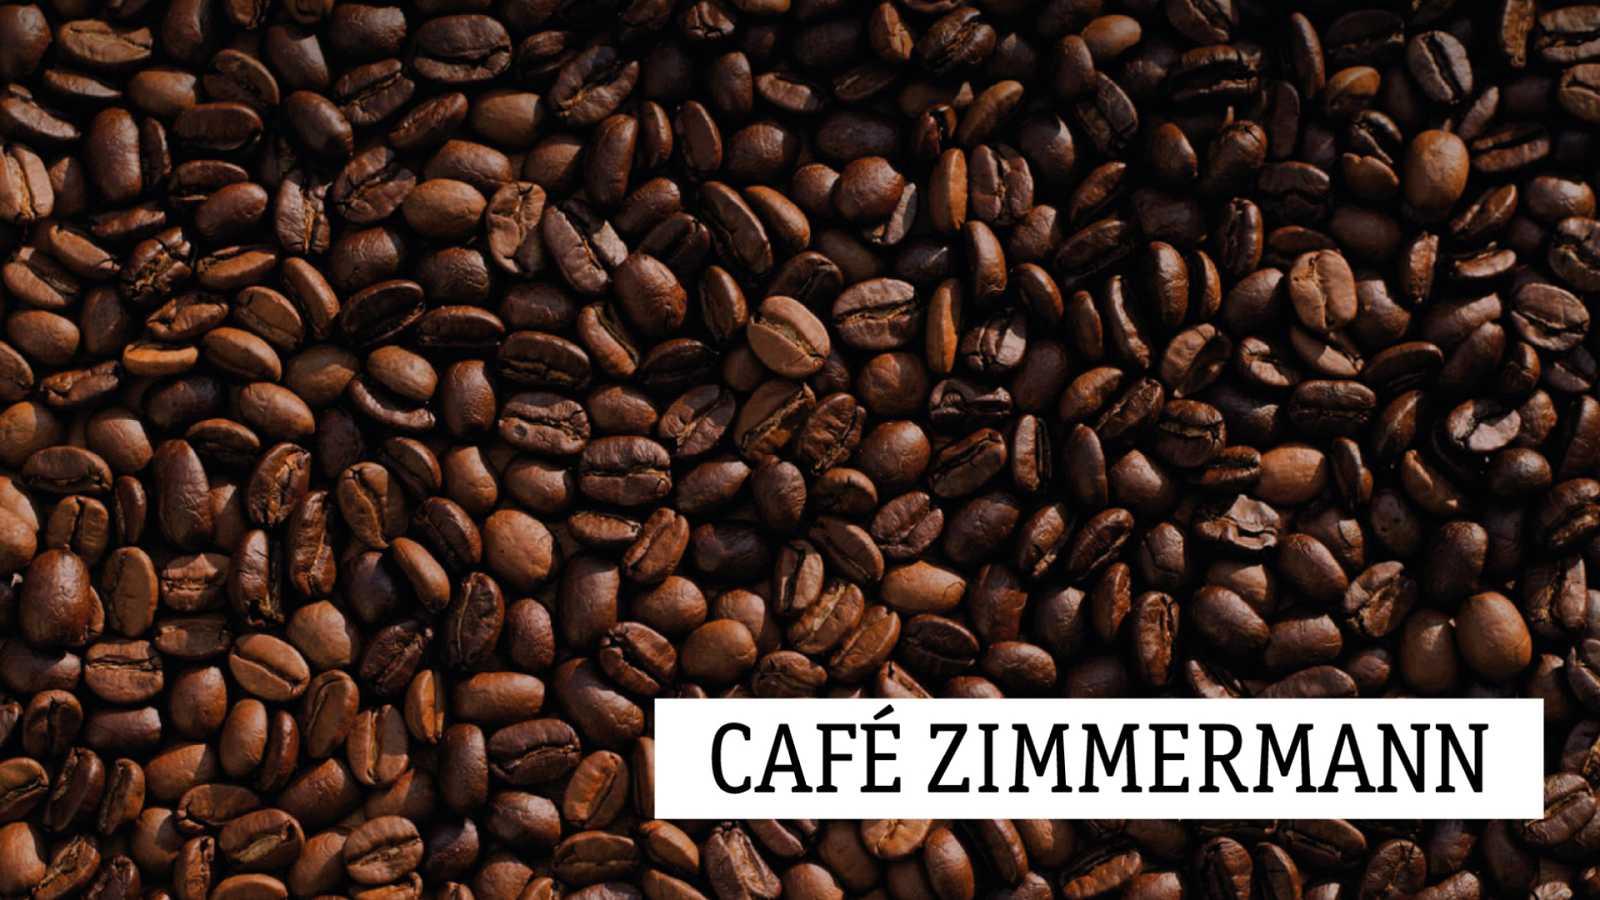 Café Zimmermann - Acunar las penas - 22/04/20 - escuchar ahora